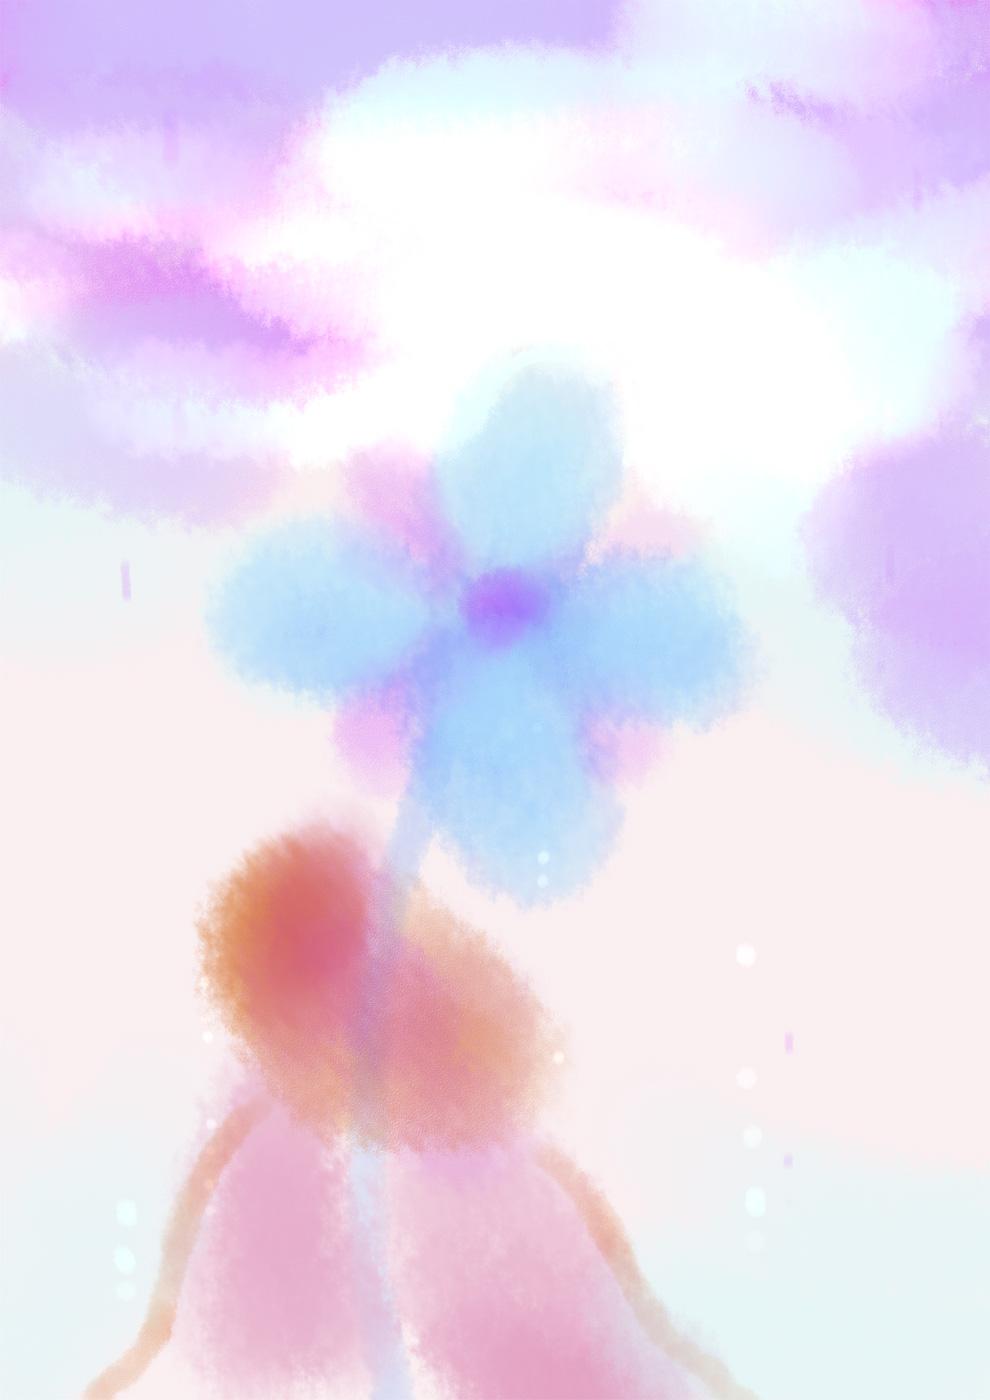 http://ahito.com/comic/ehon/kamiuta/img/2018/20180322/04.jpg